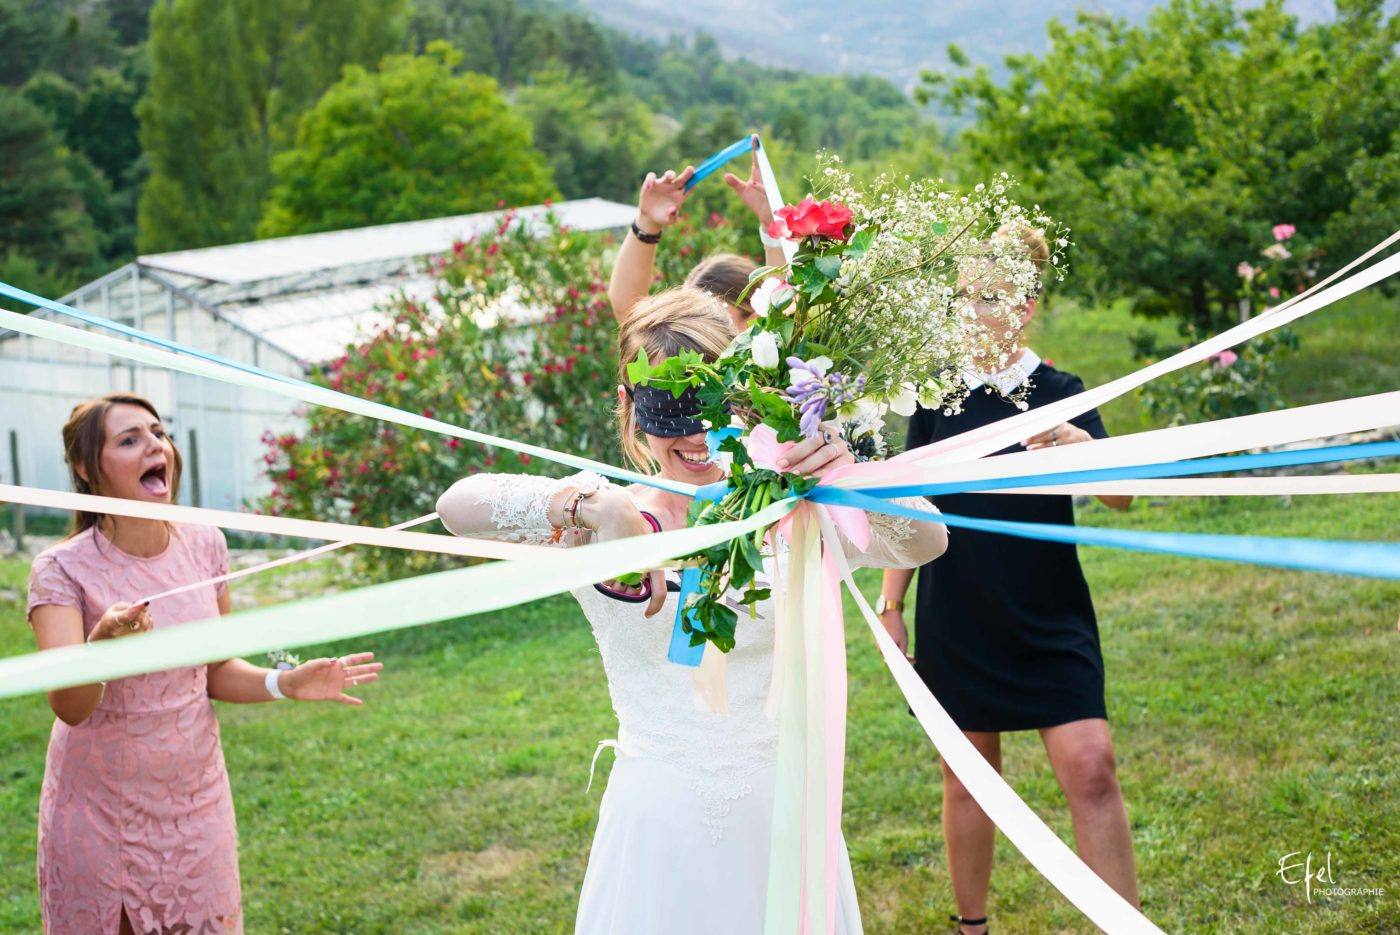 la mariée coupe les rubans au jeu du ruban - photographe mariage gap